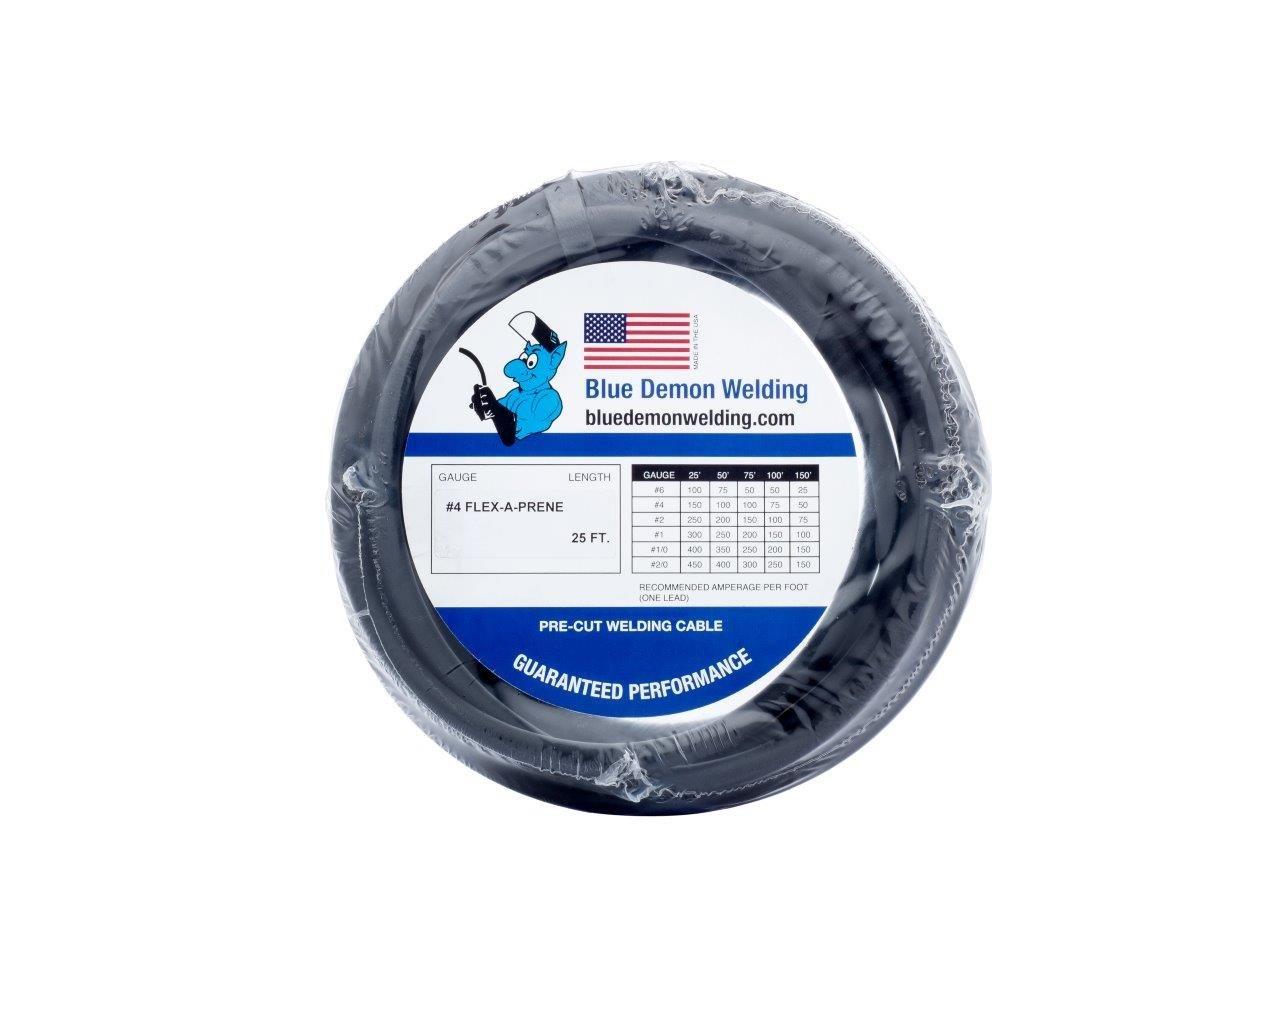 Blue Demon #4 Guage Flexaprene welding cable, black, 25', shrink wrapped